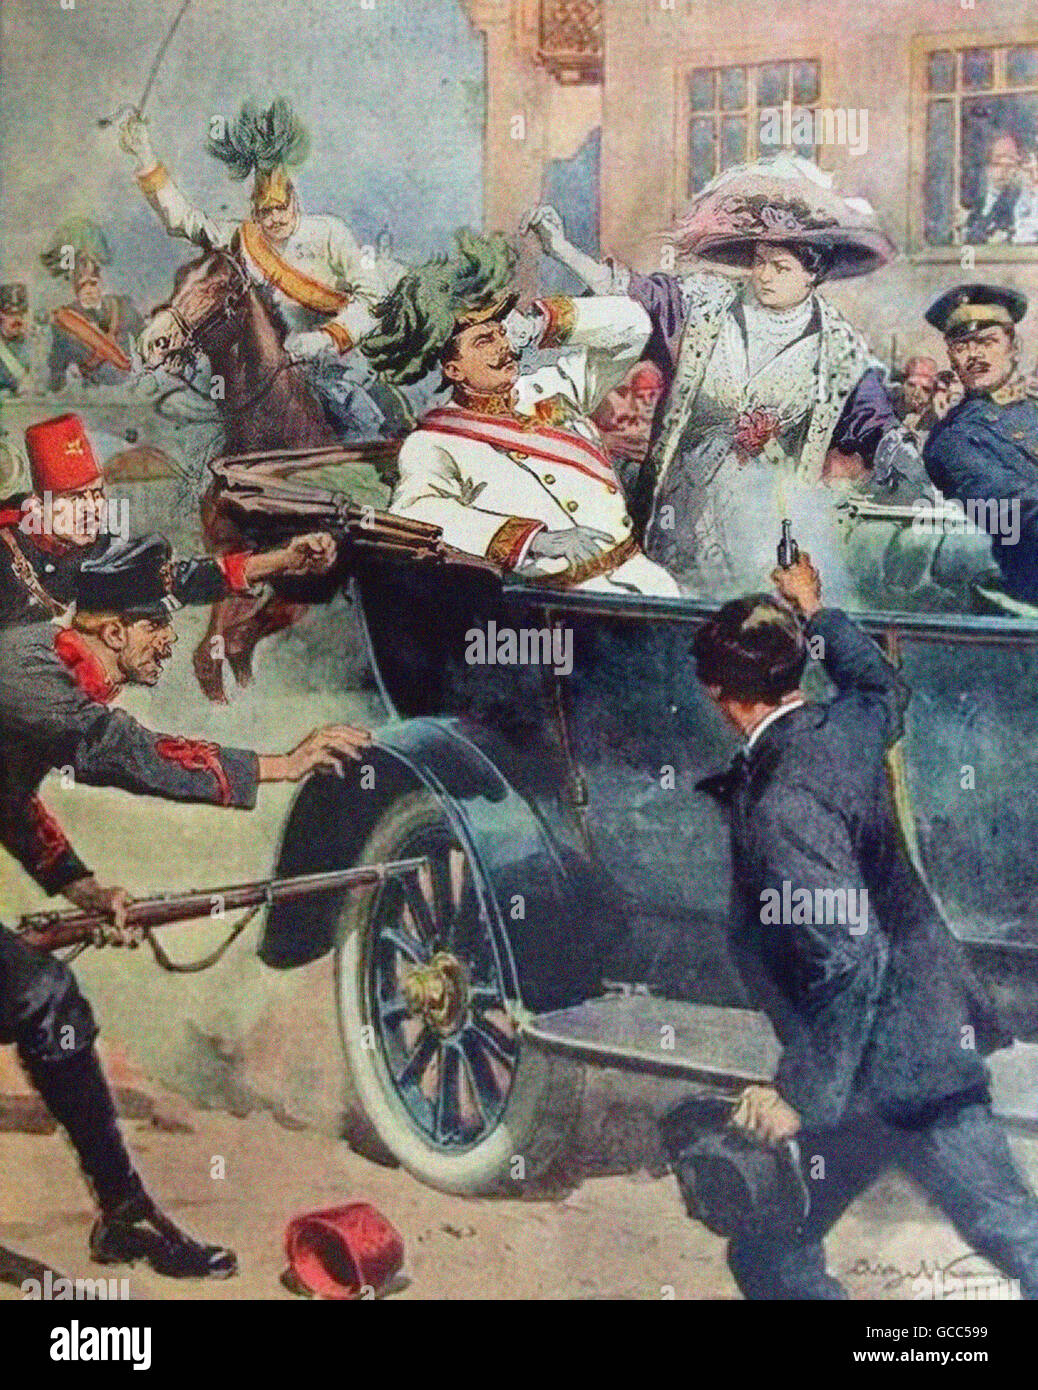 Assassination of Archduke Franz Ferdinand of Austria on 28th June 1914, - Stock Image